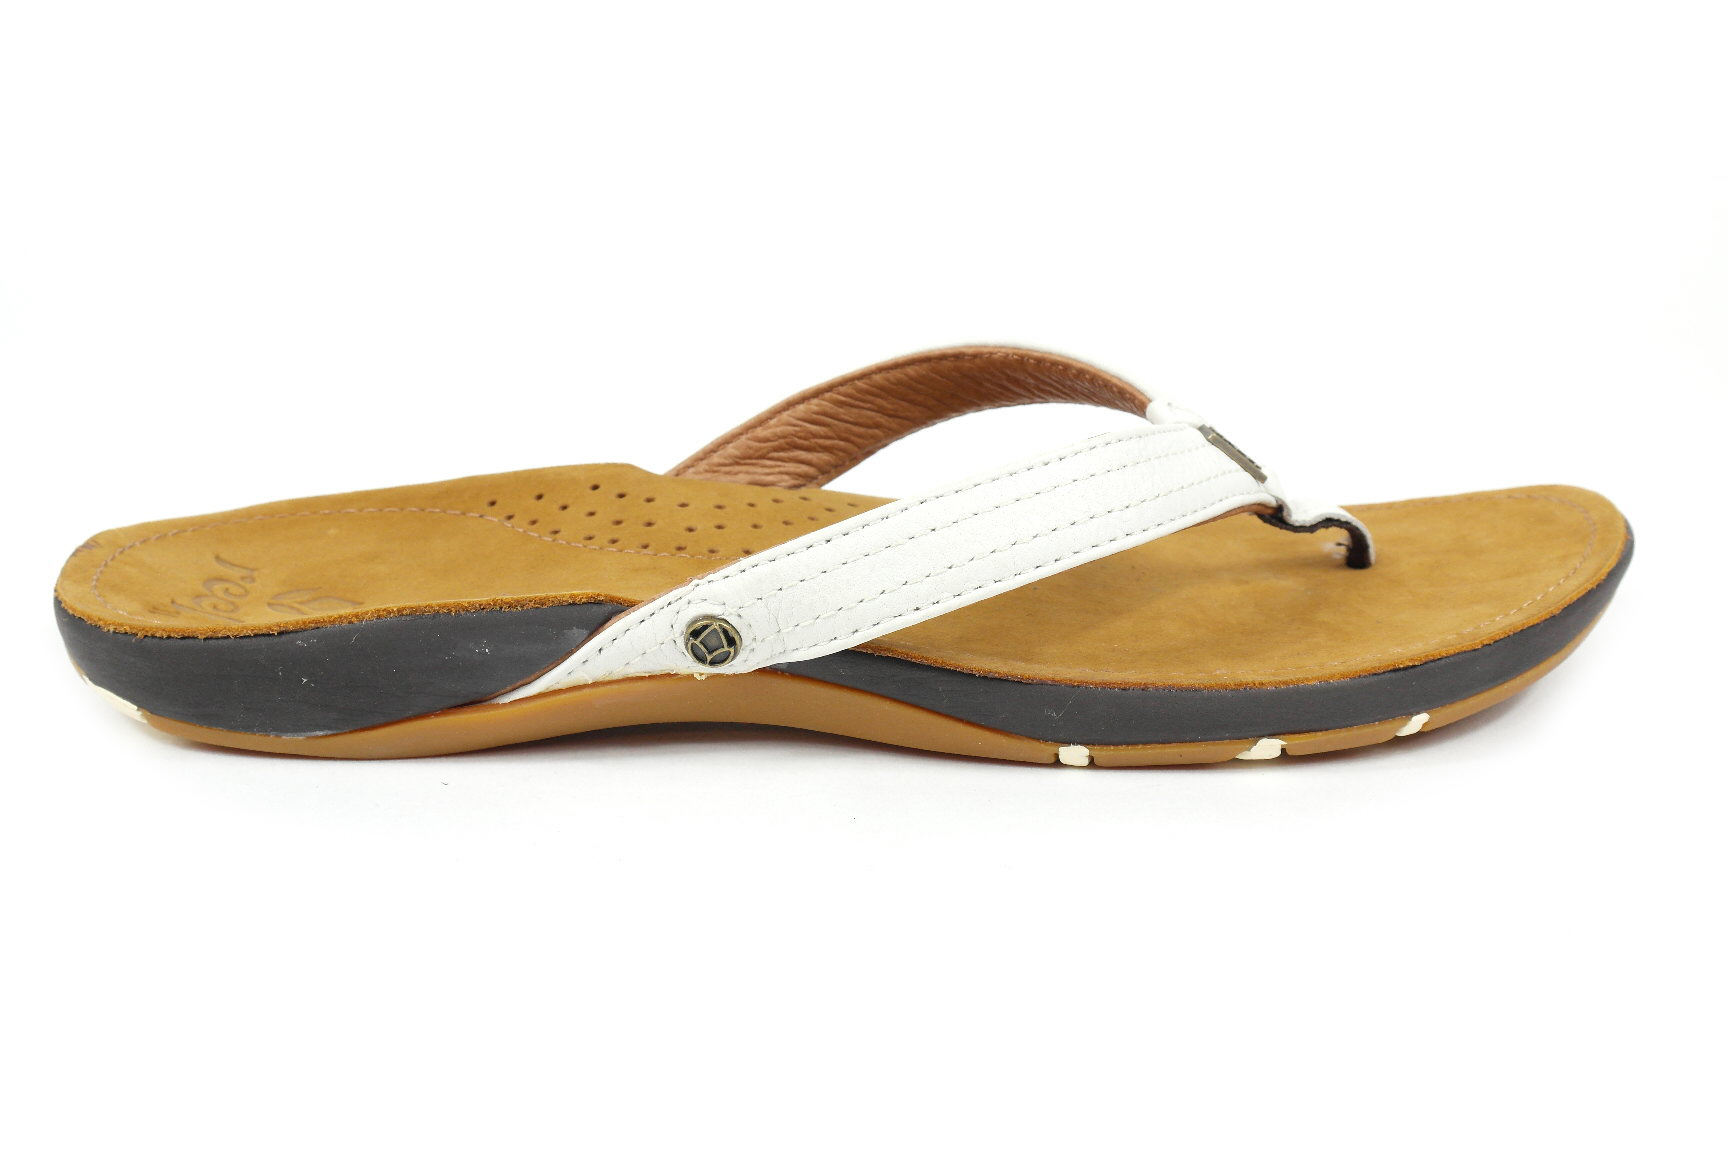 52a79568659 Reef Miss J-Bay dames slippers wit van slippers & sandalen